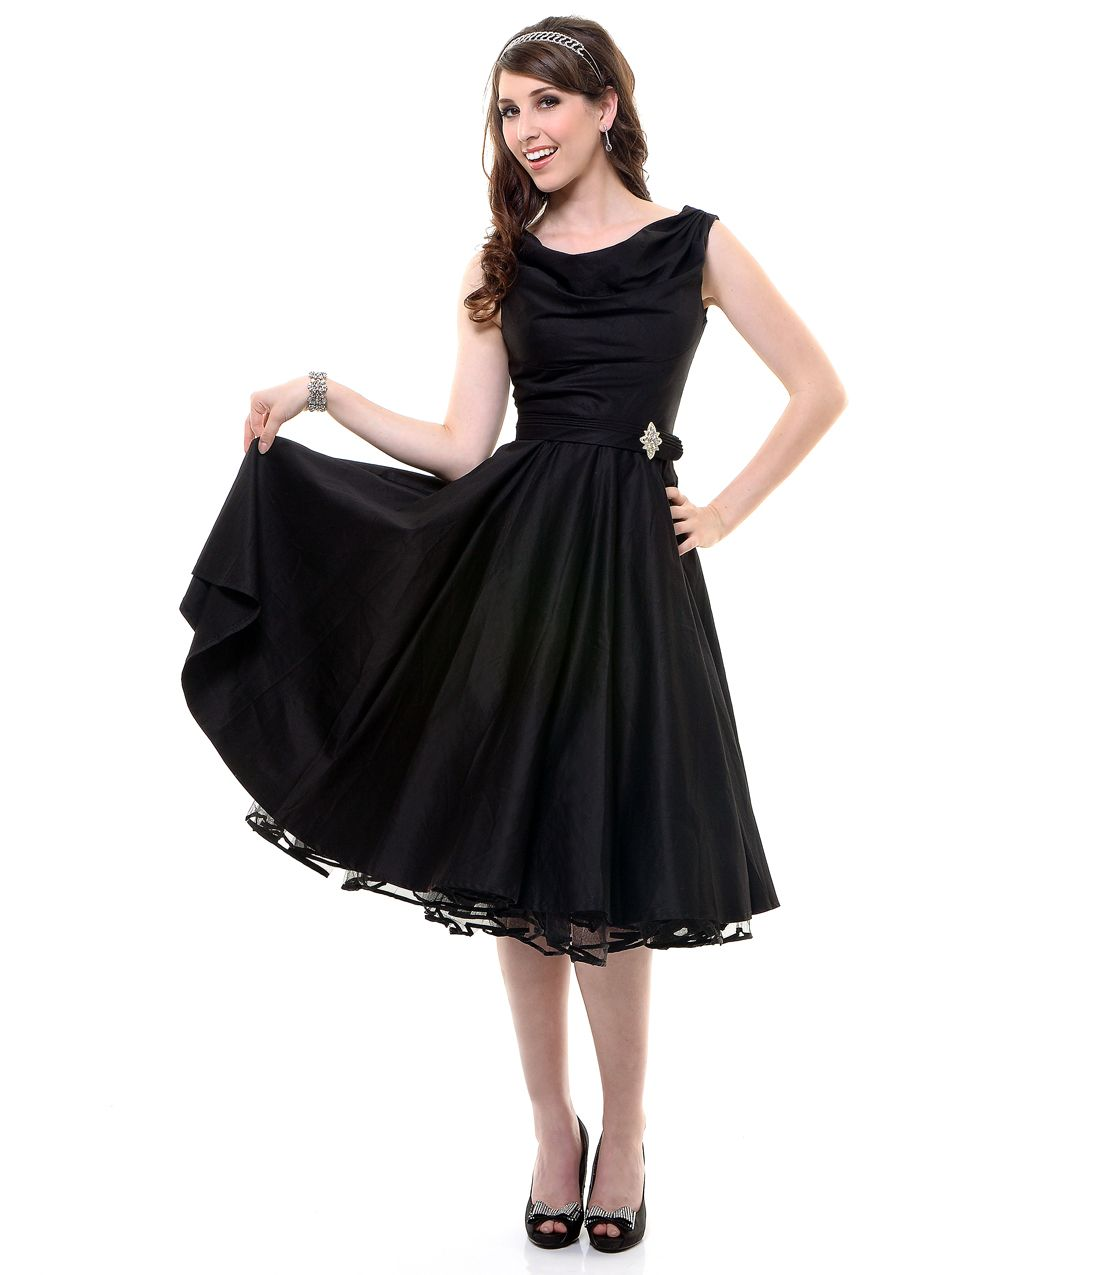 Black scoop neck belted swing dress unique vintage prom dresses retro dresses